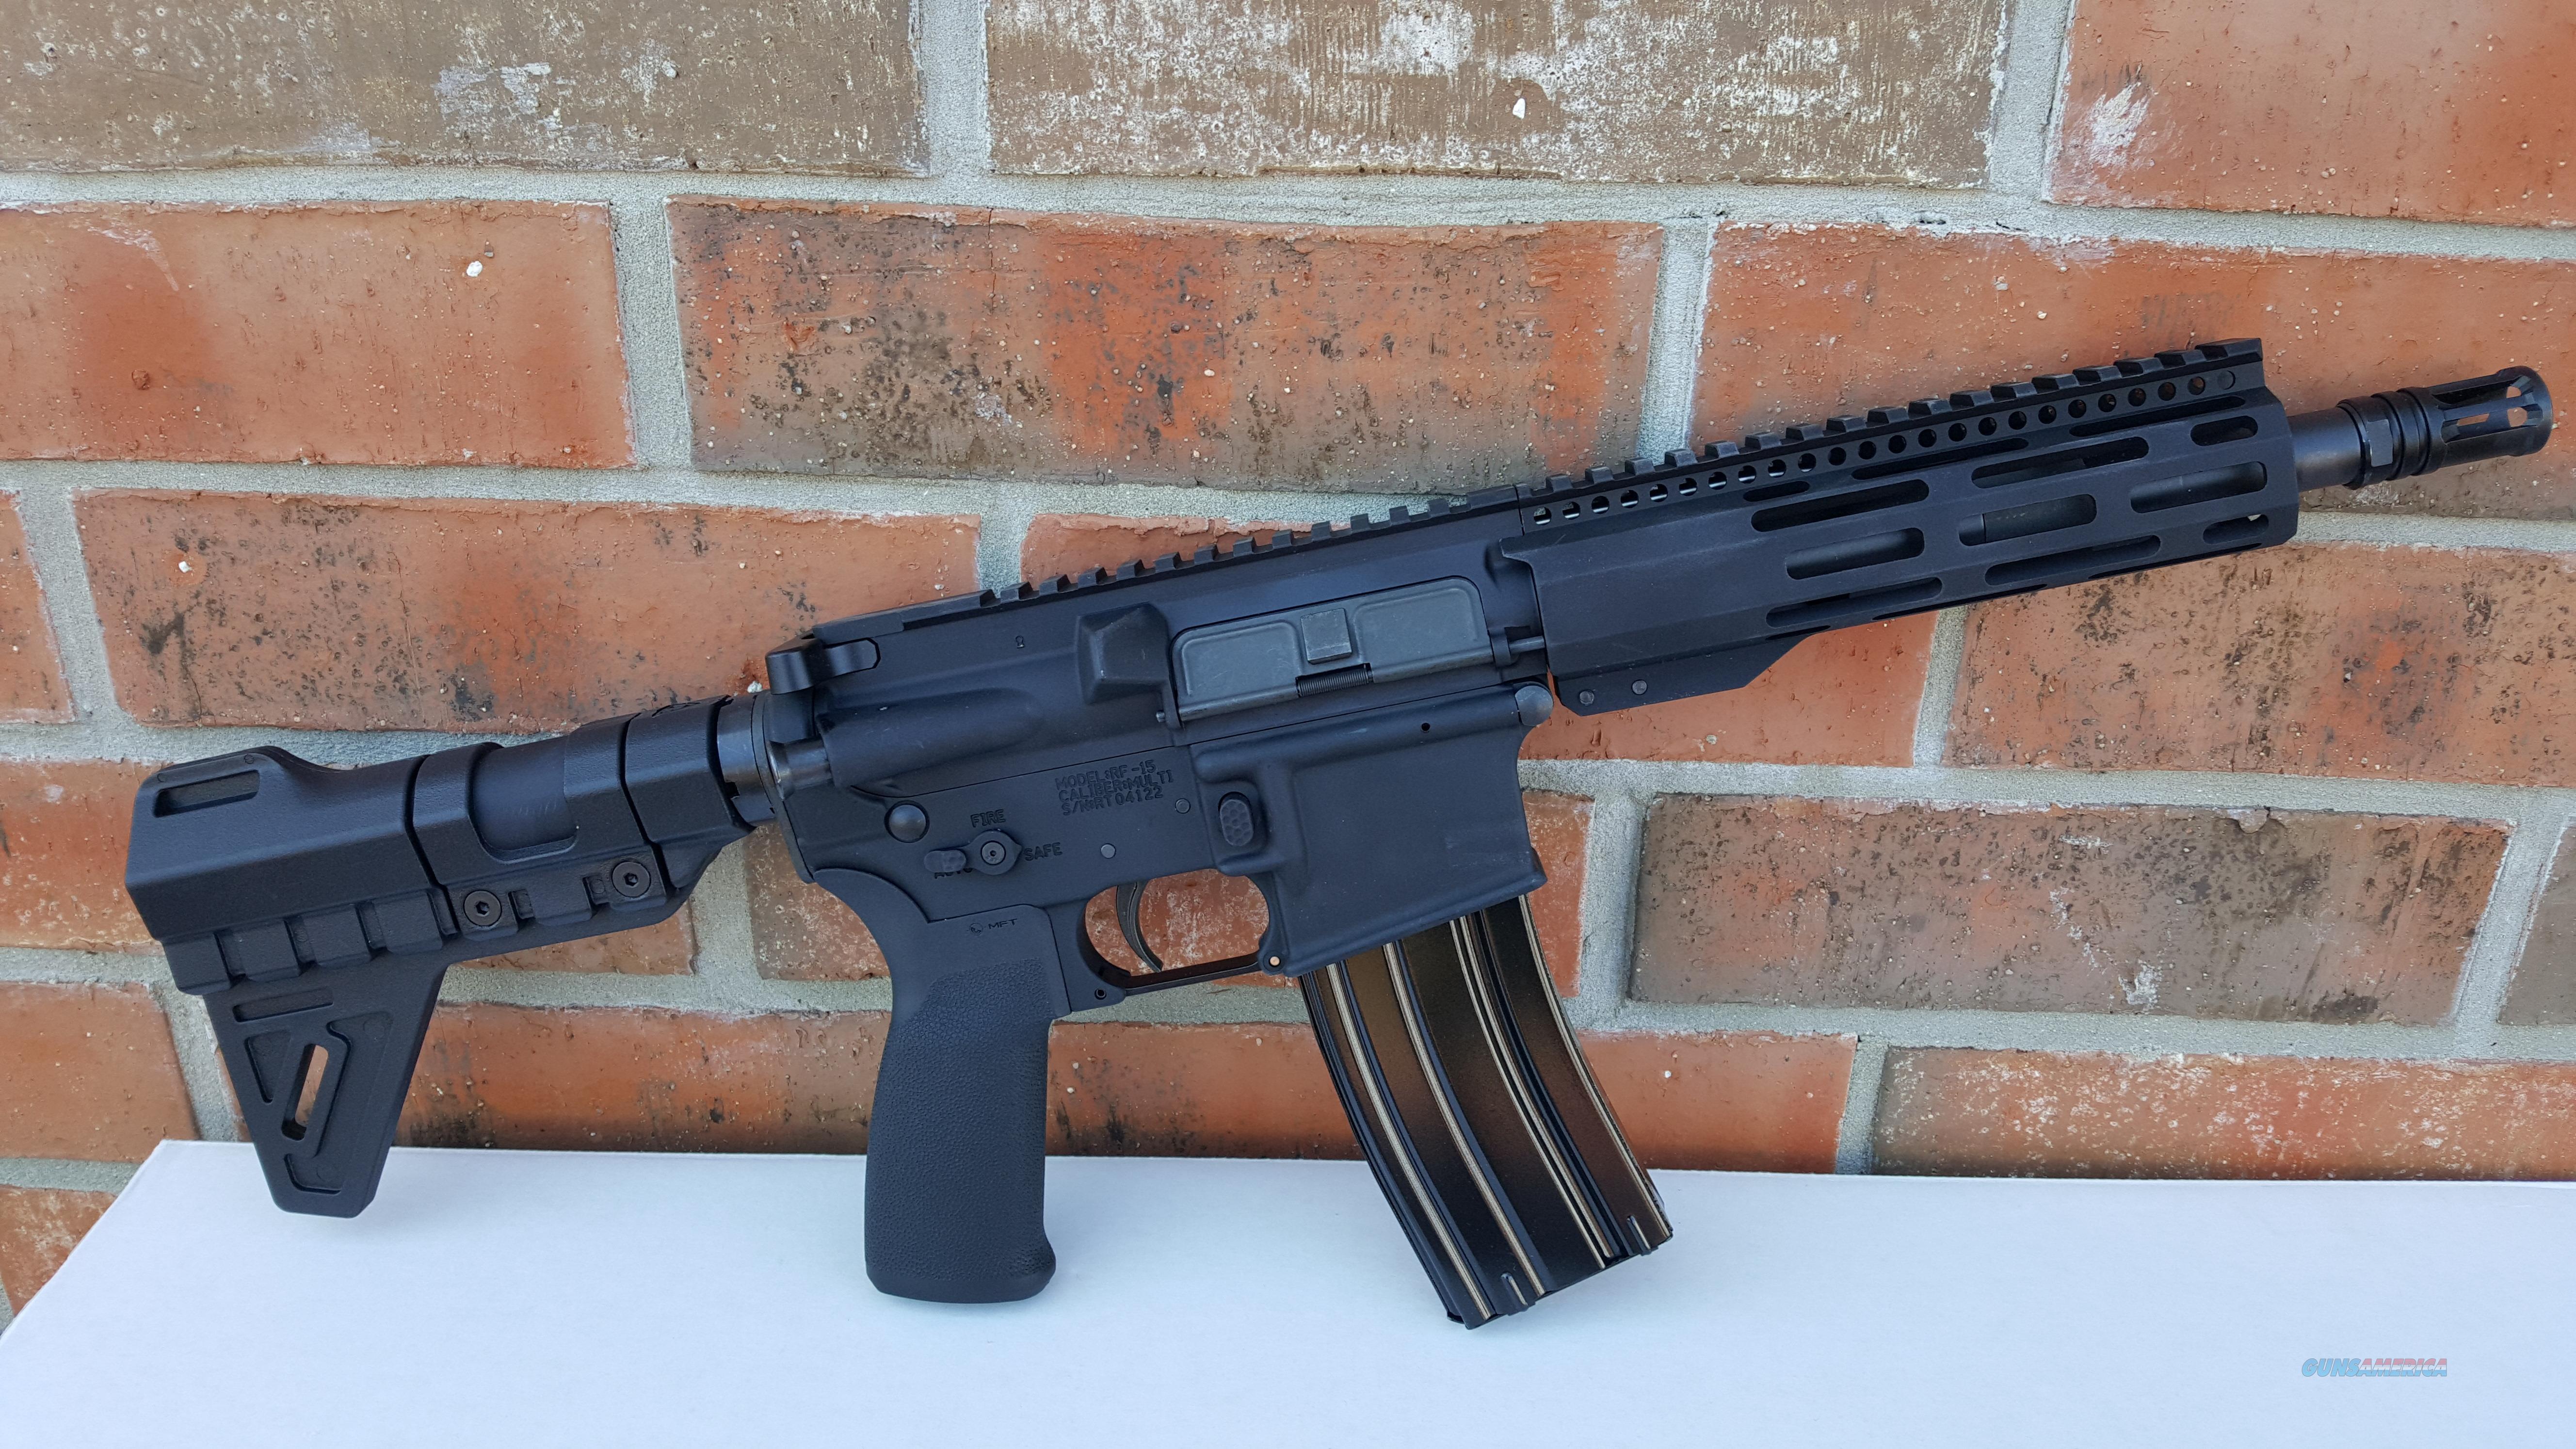 "Radical Firearms AR 15 AR15 Pistol 300 AAC Blackout 8.5"", Trinity Force PISTOL Blade, Alum. Hand Guard FREE LAYAWAY!!  Guns > Rifles > AR-15 Rifles - Small Manufacturers > Complete Rifle"